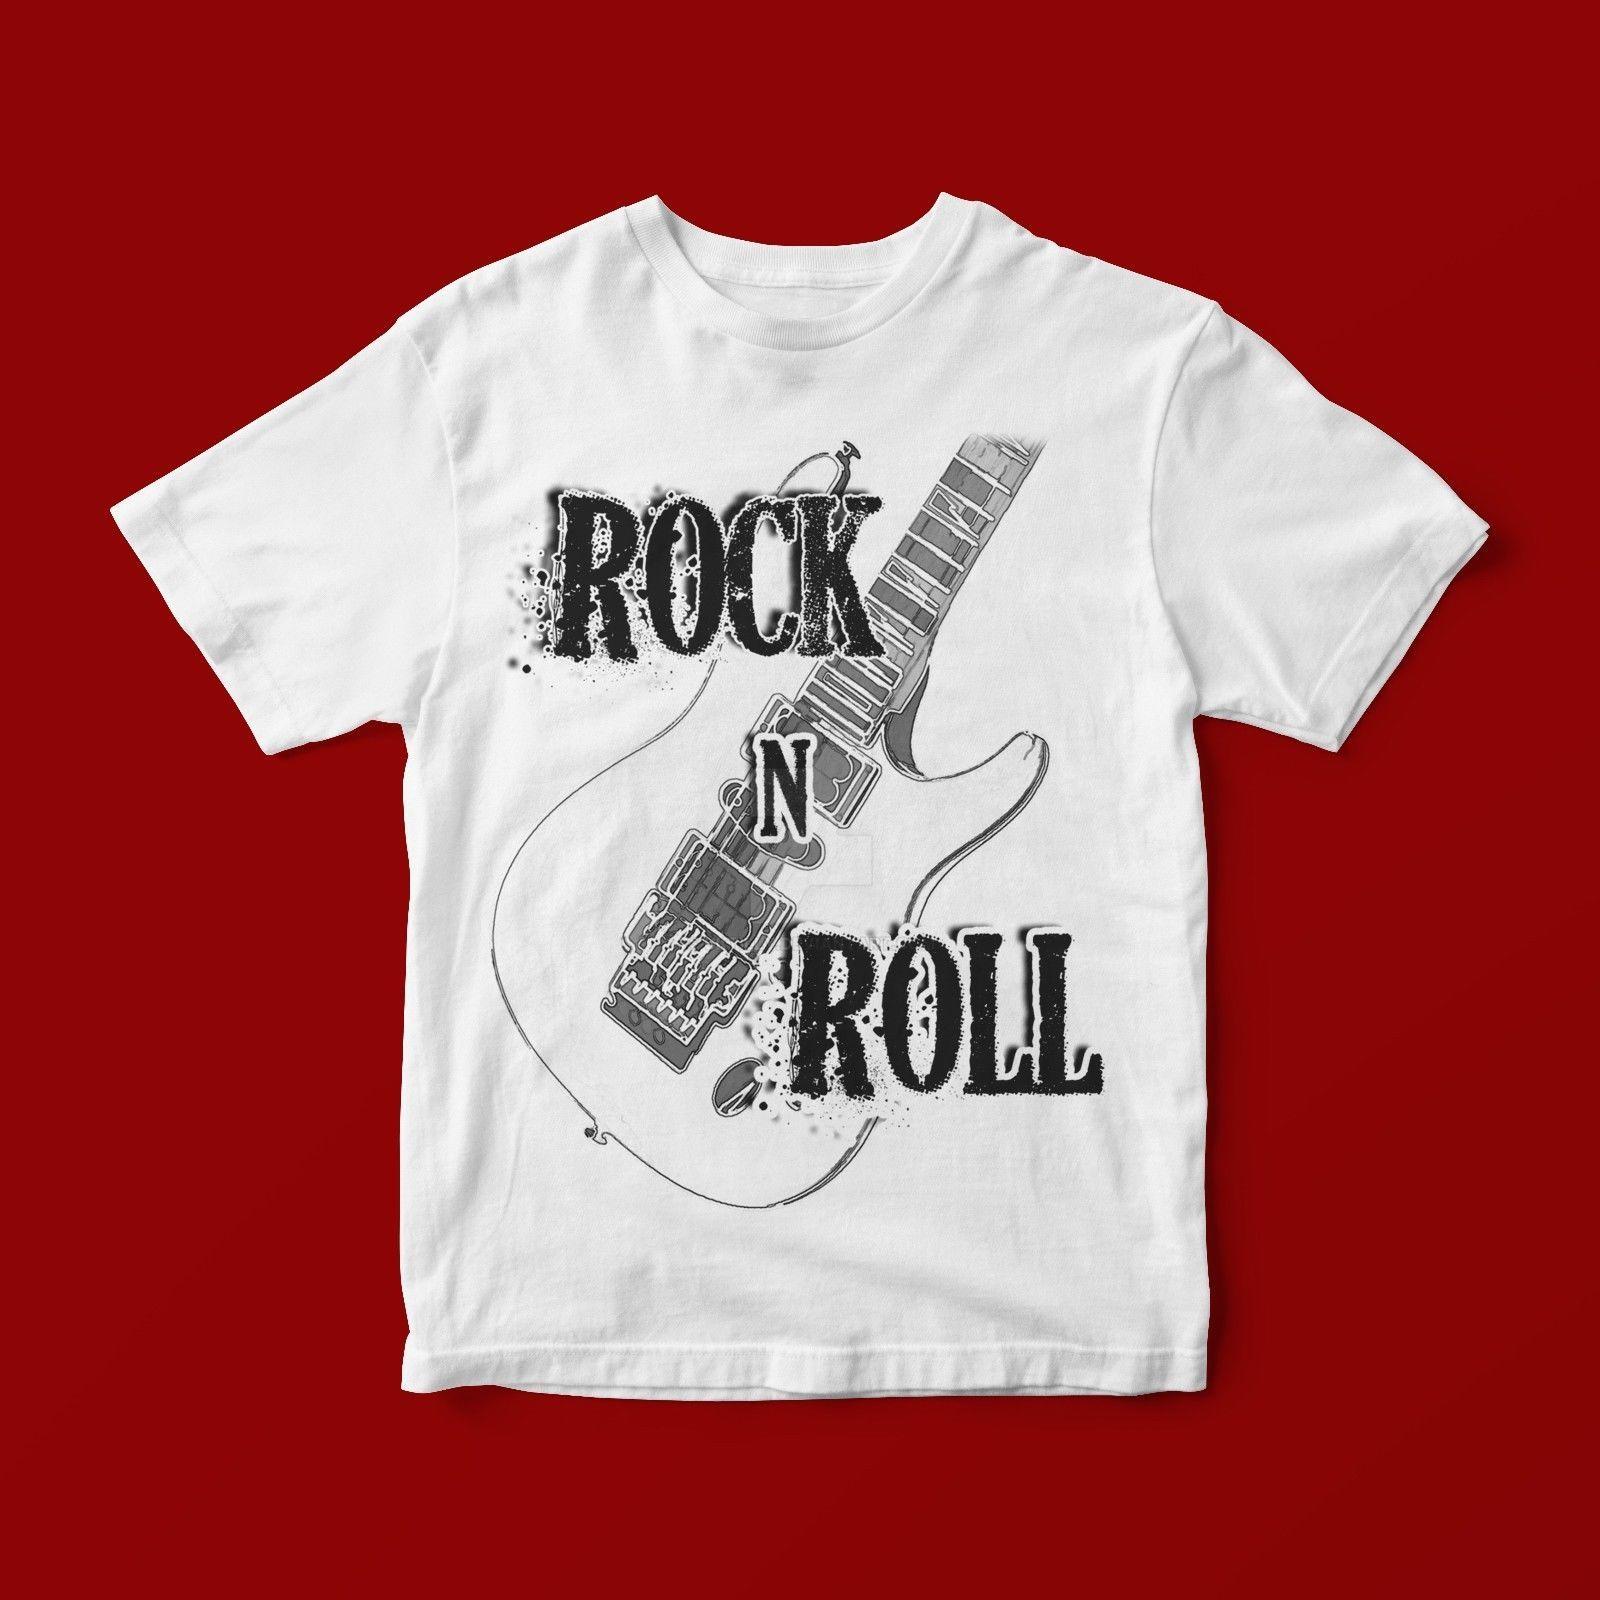 2e0a256e5ac Achat rock and roll t shirts - 62% OFF! - www.joyet-traiteur.com